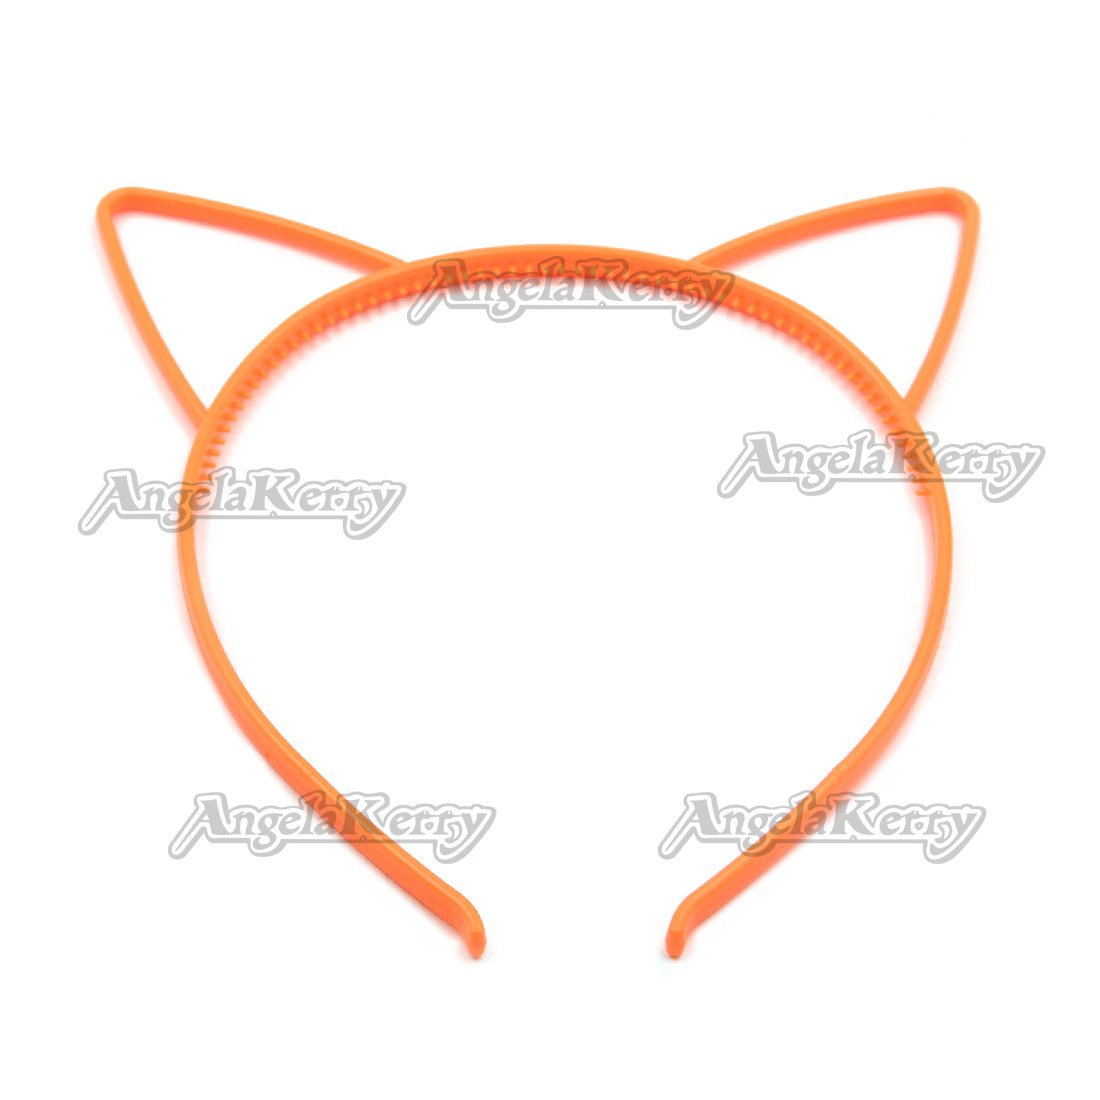 Amazon.com : AngelaKerry 50pcs Orange Cat Ear Plastic Headbands Hairbands Bow for Girls Fashion Party DIY (Orange, Pack of 50pcs) : Beauty